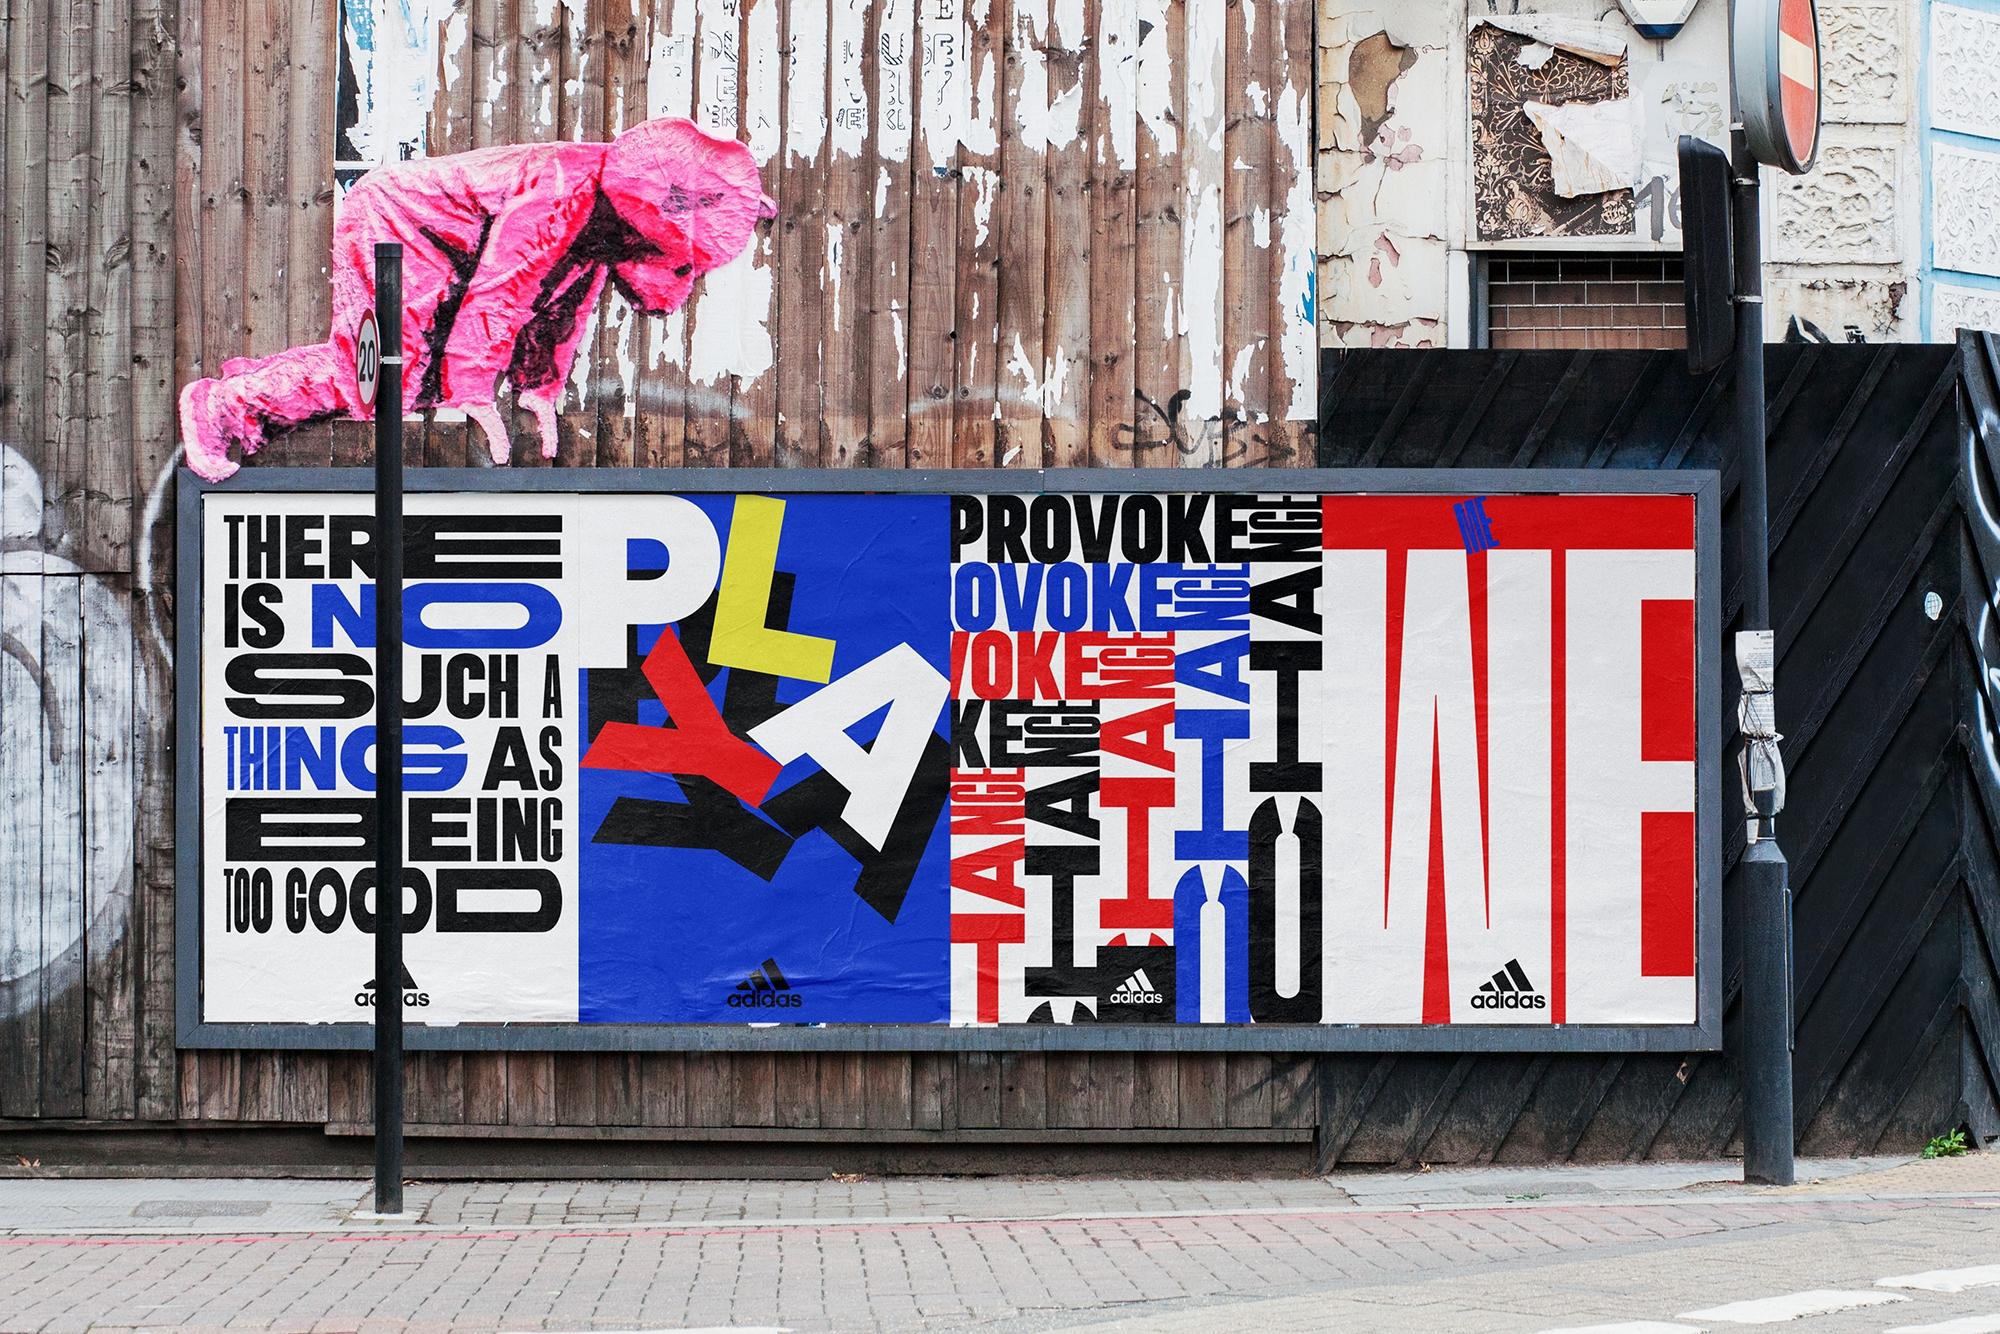 Adidas London commissioned crea - yarzatwins | ello